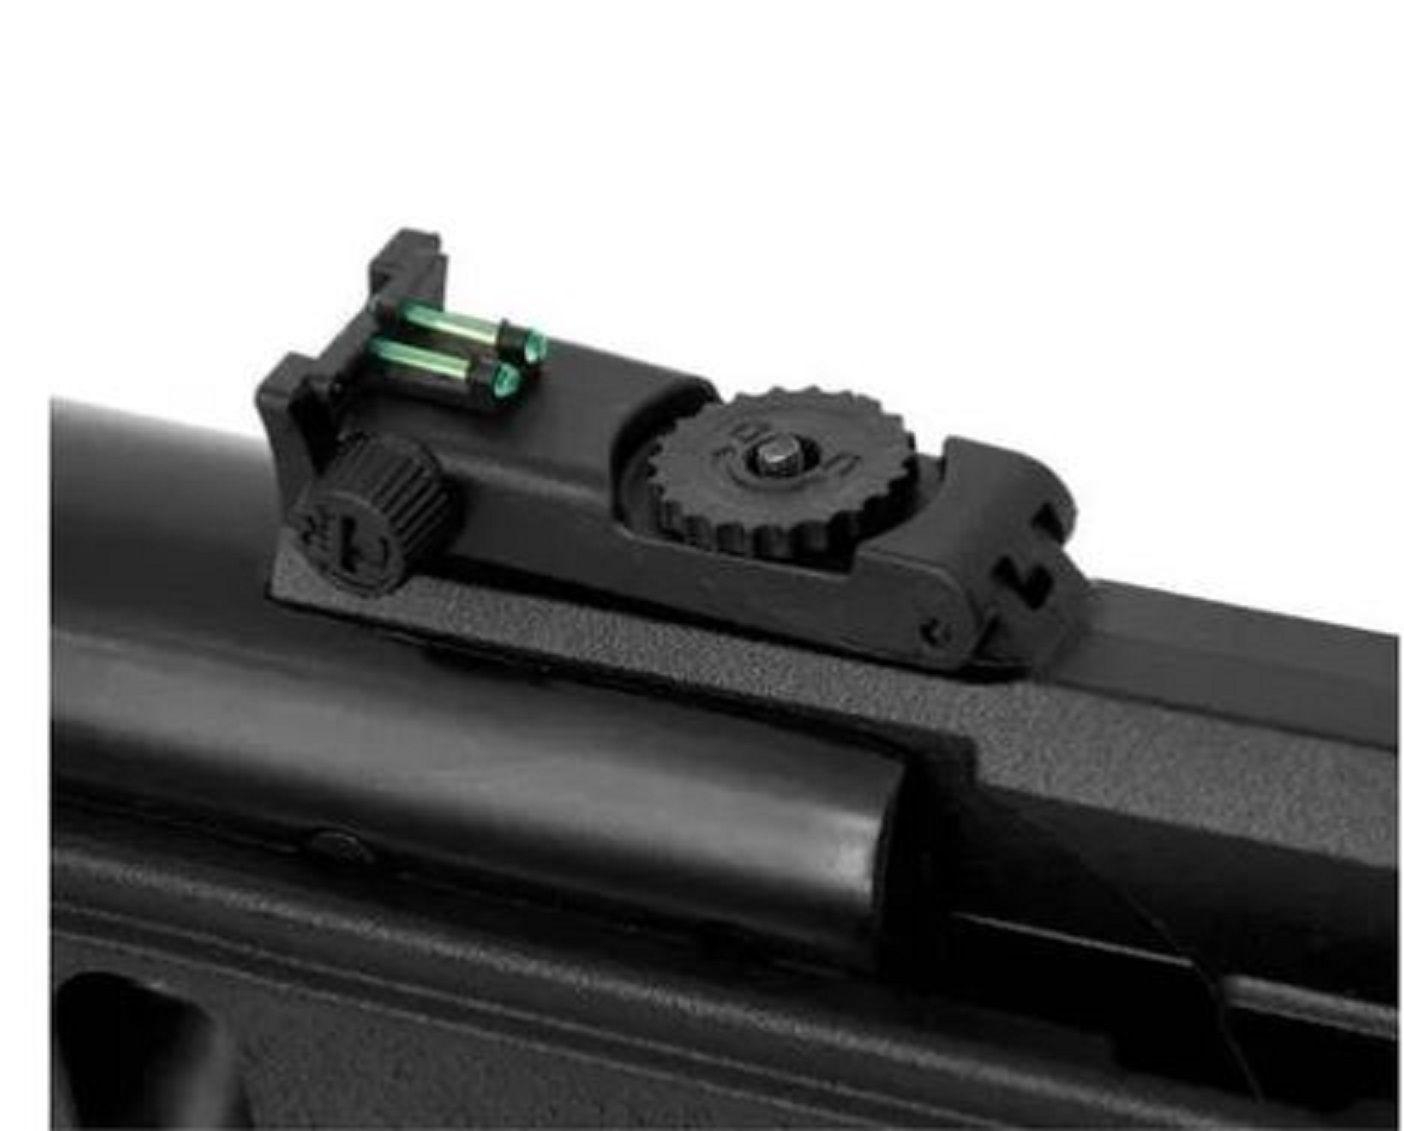 Carabina de Pressão CBC 5.5mm Jade Pro OX PP